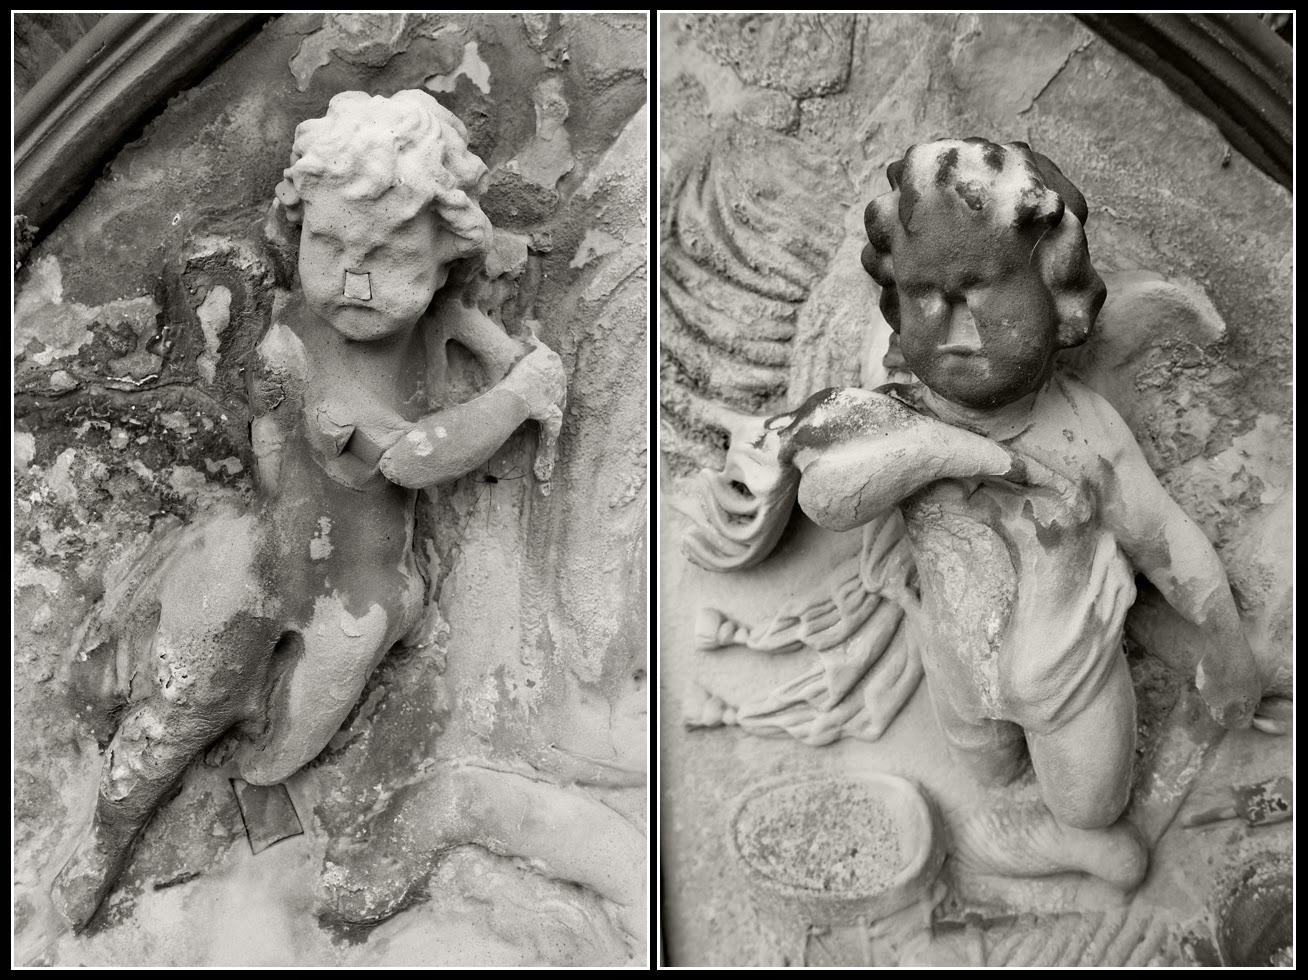 Spring Grove Cemetery; Cemetery; Graveyard; Tombstone; monument; mausoleum; Cincinnati; Autumn; Chreubs